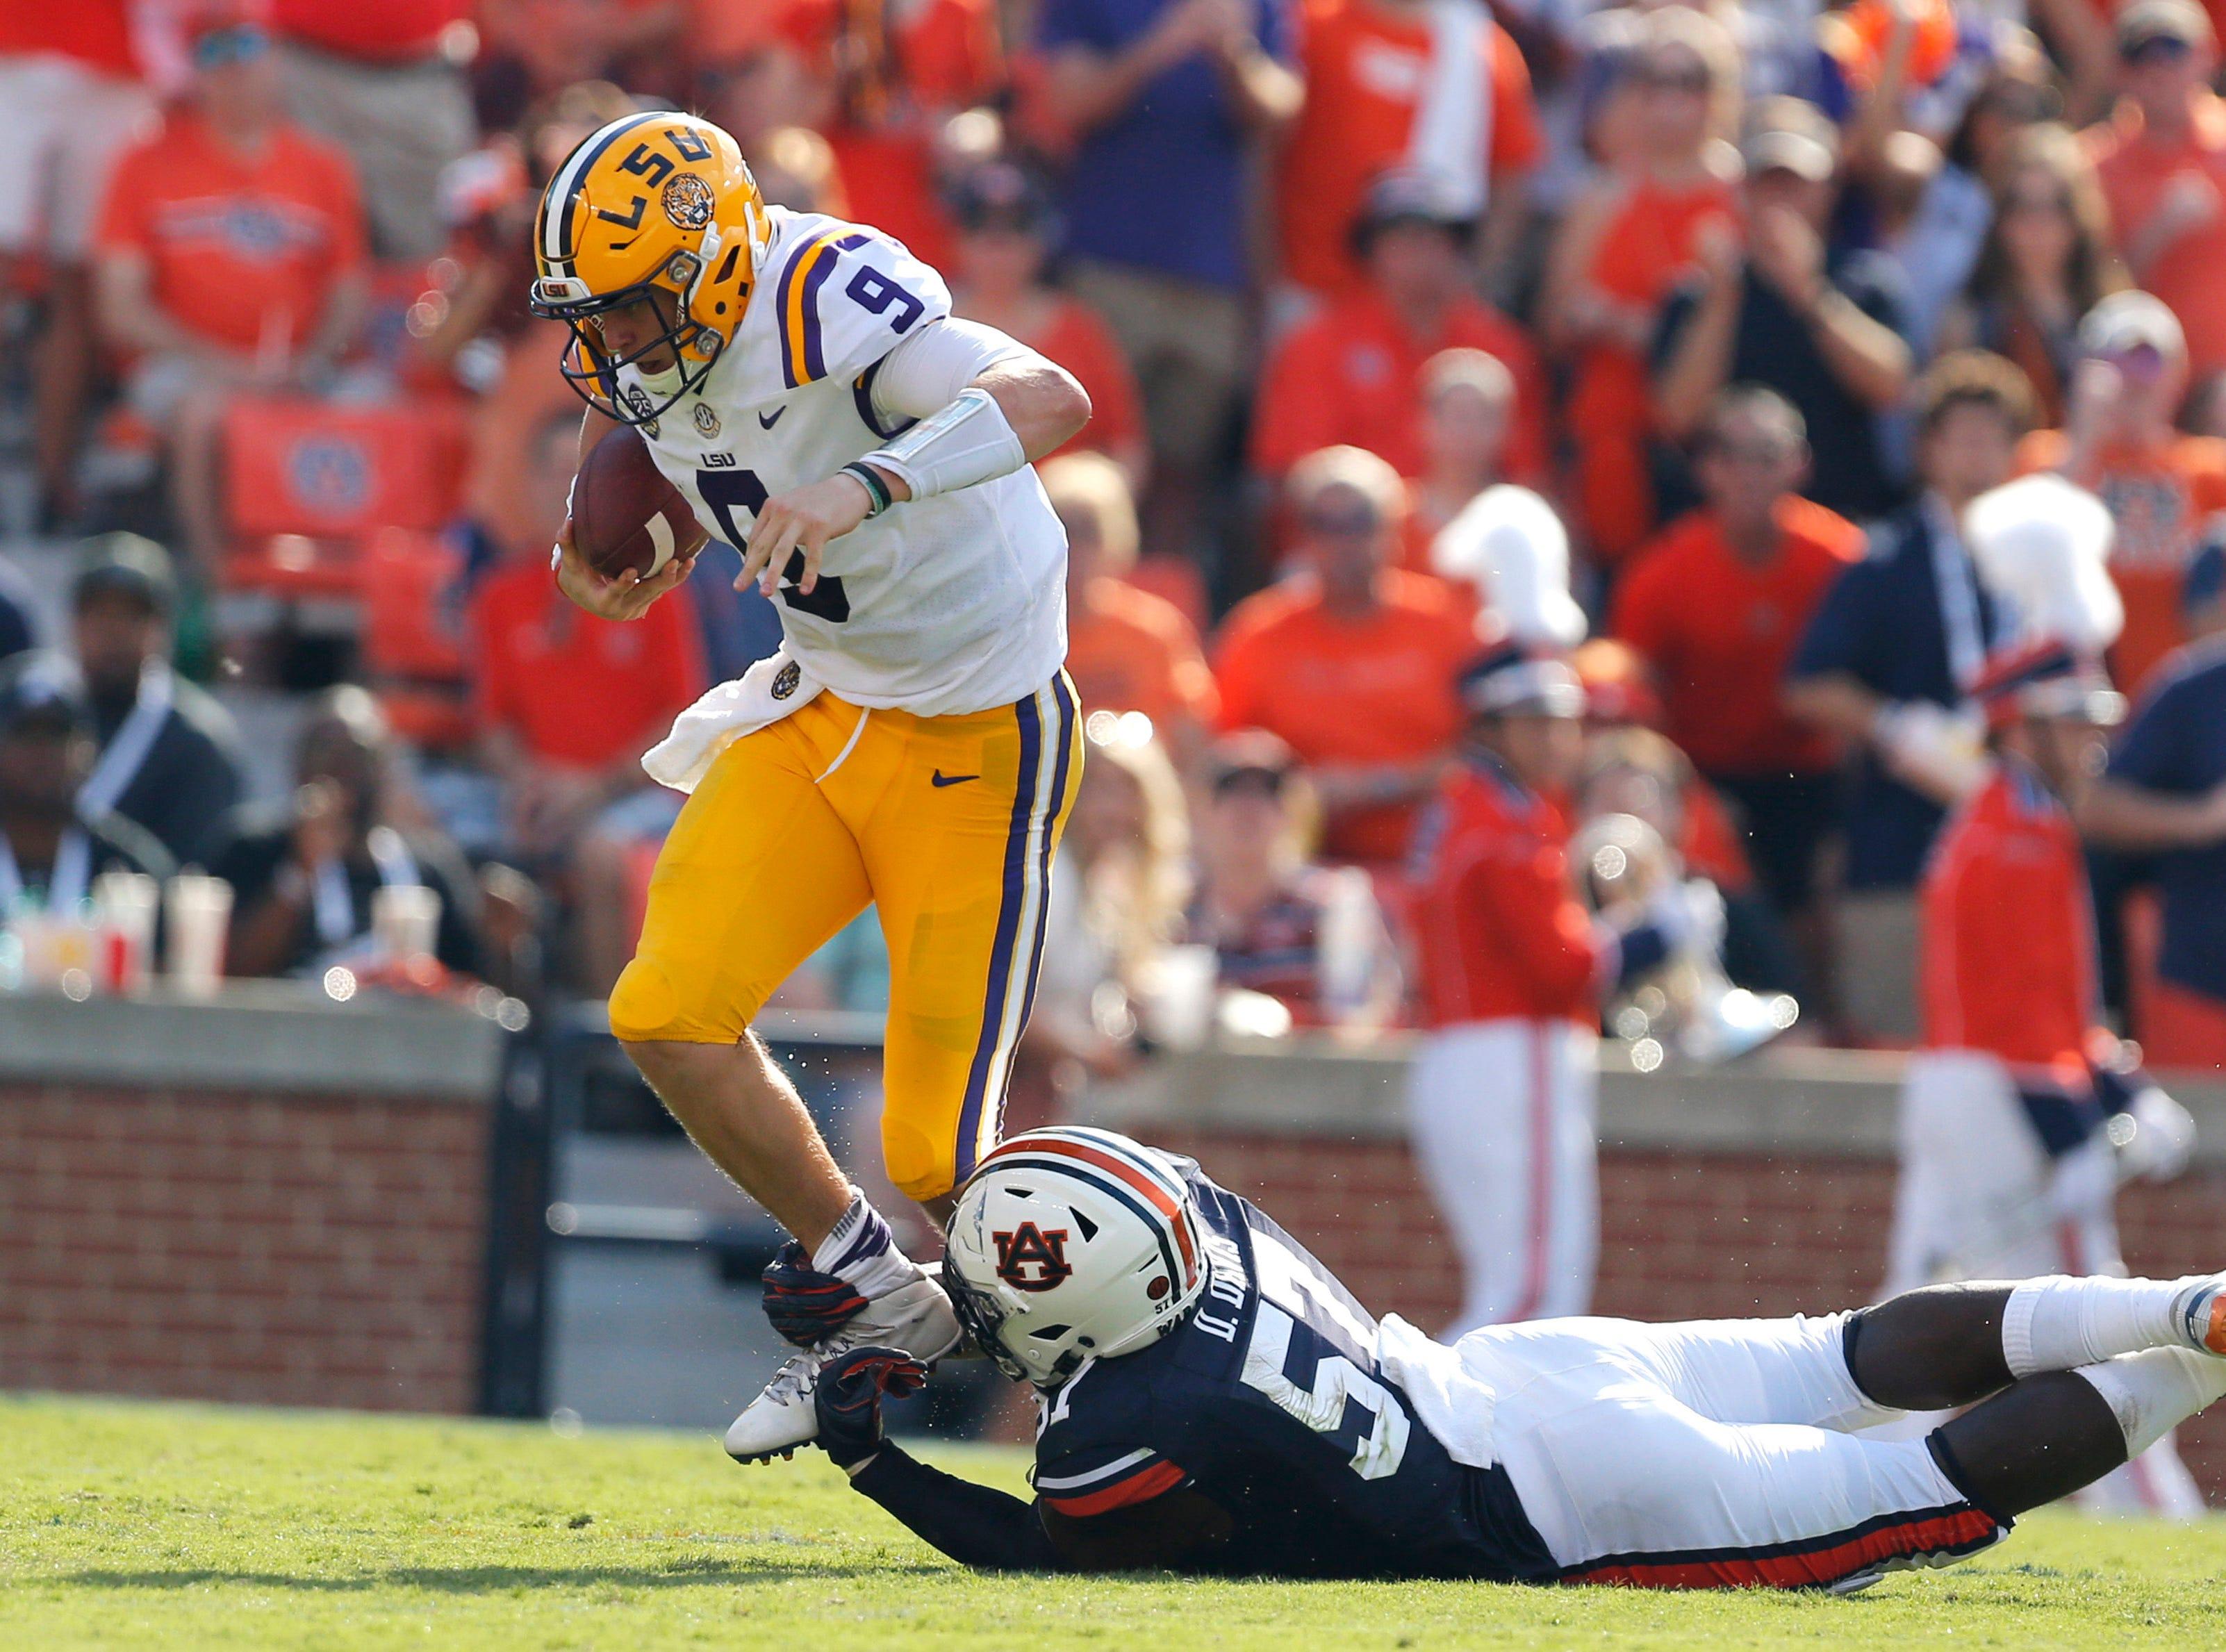 Sep 15, 2018; Auburn, AL, USA; LSU Tigers quarterback Joe Burrow (9) is tripped by Auburn Tigers linebacker Seshaun Davis (57) during the second quarter at Jordan-Hare Stadium. Mandatory Credit: John Reed-USA TODAY Sports